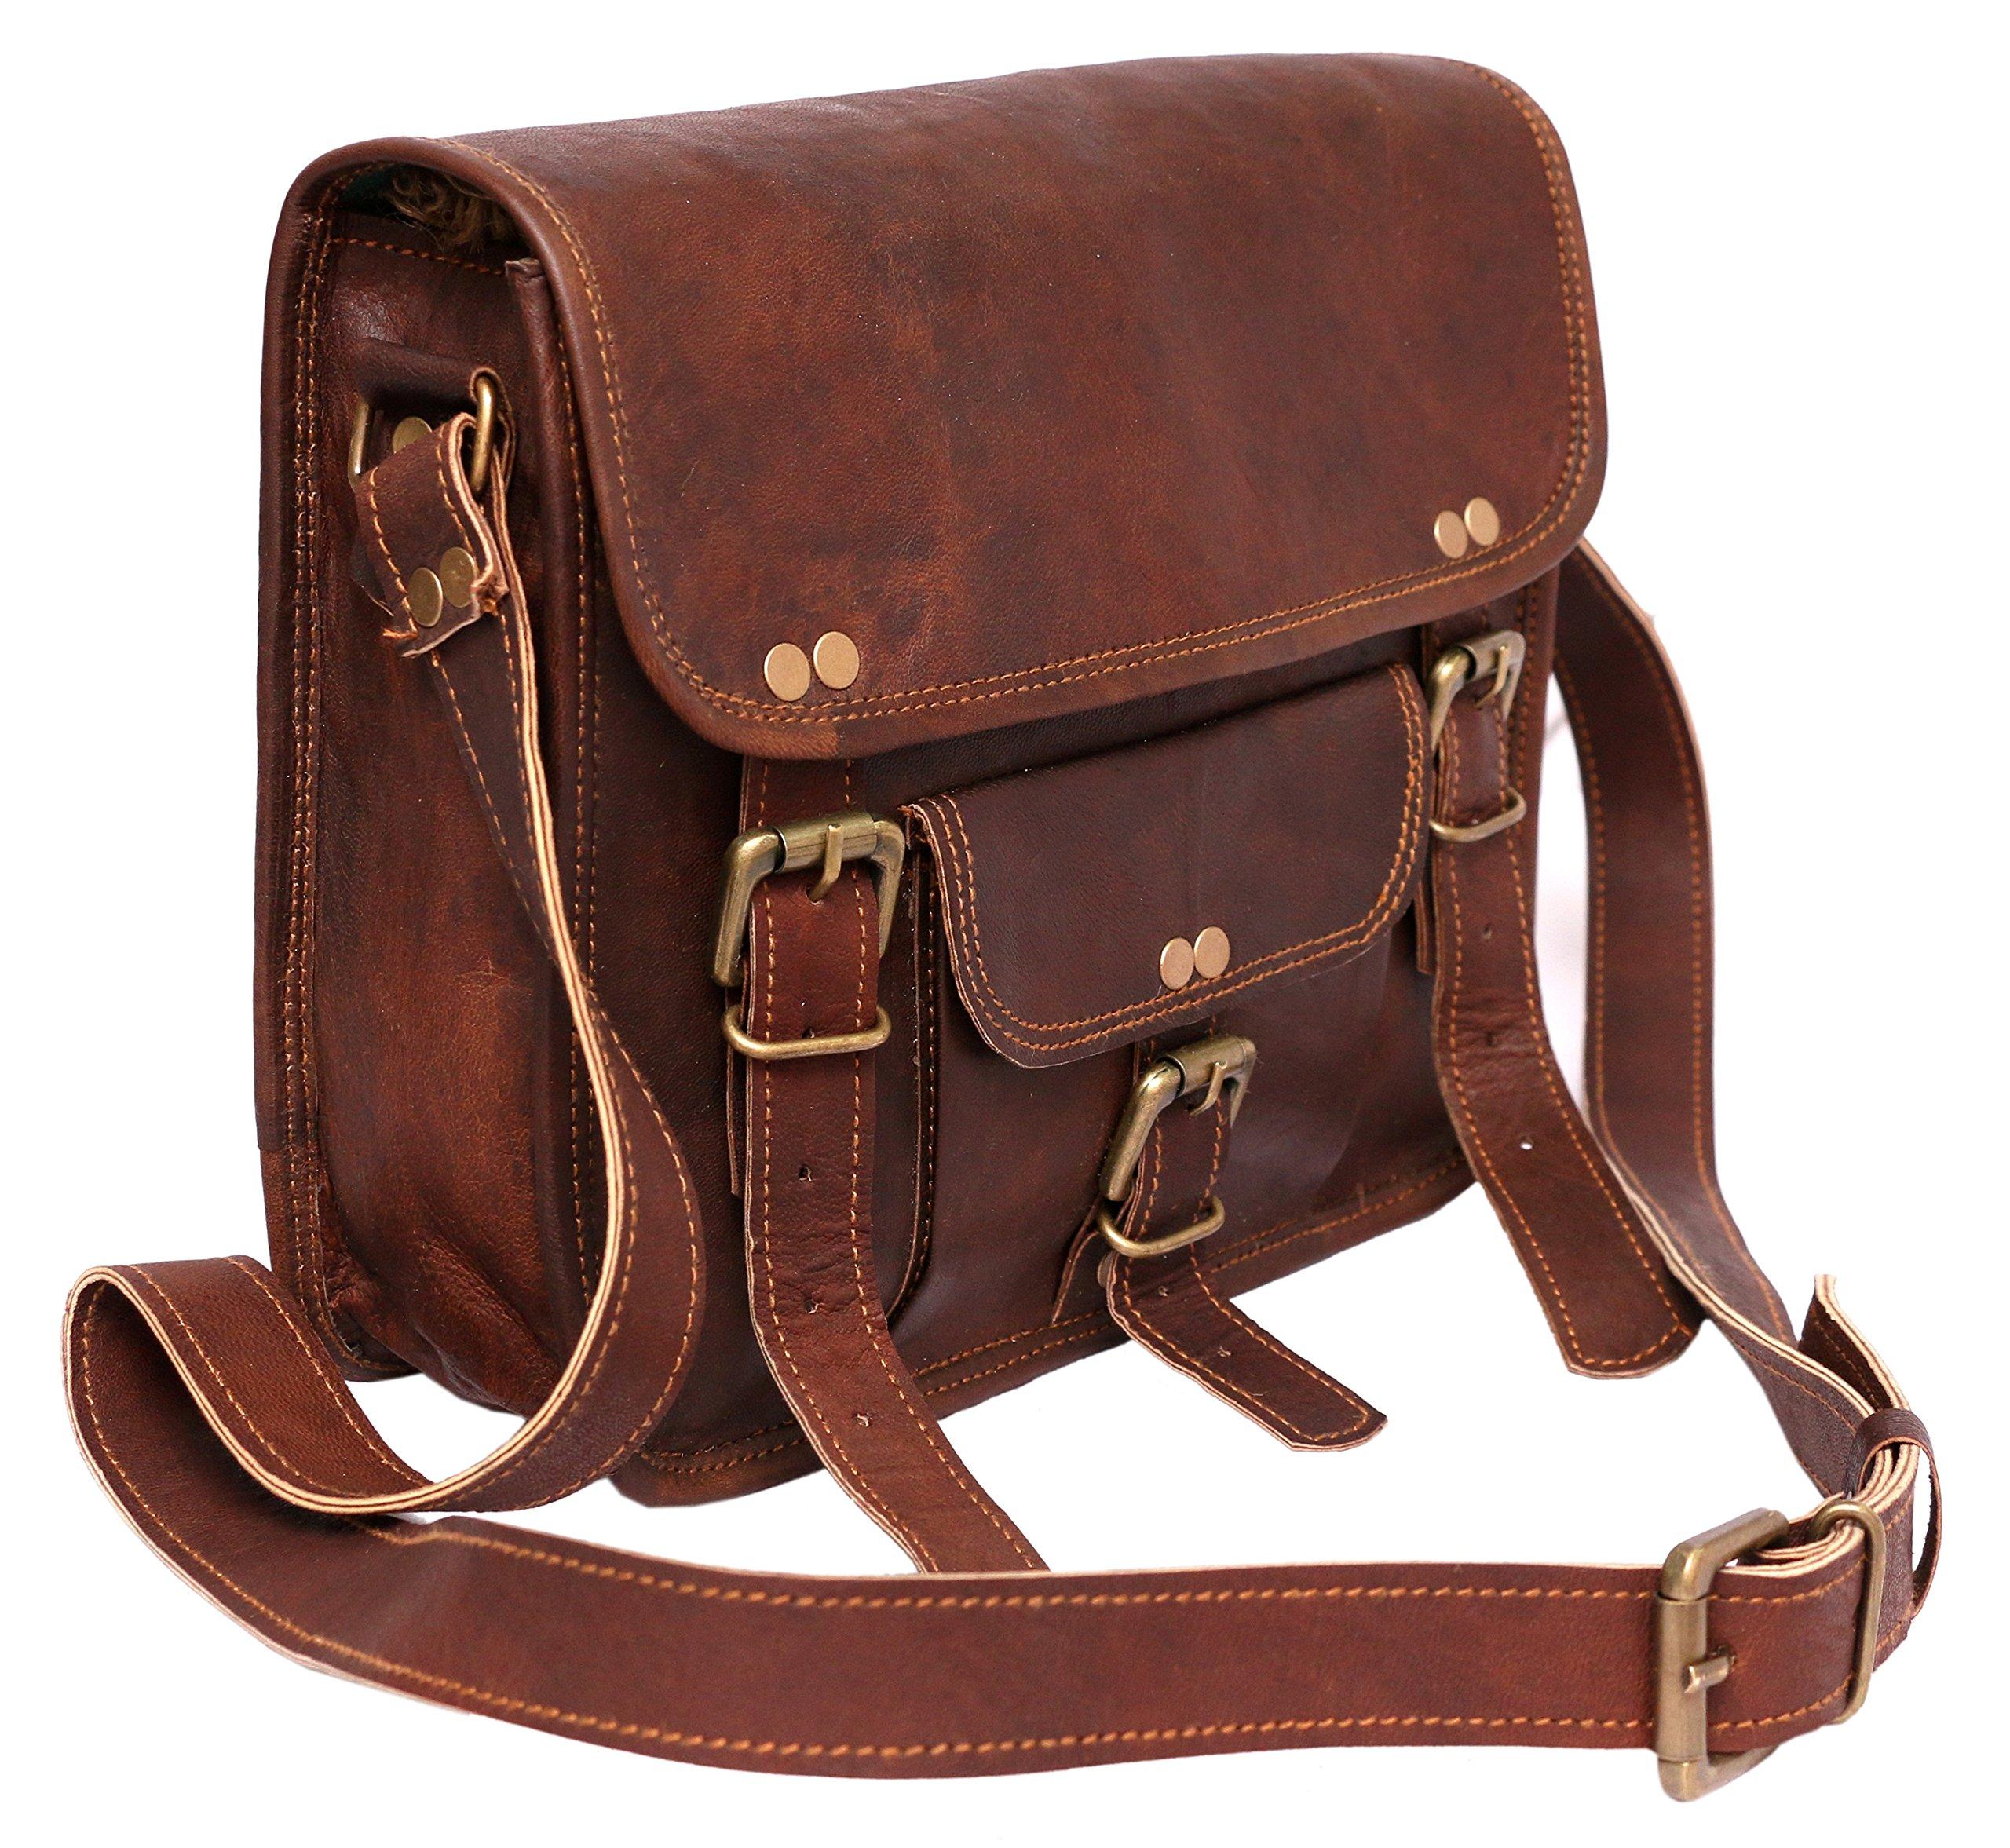 Right Choice 11'' Leather Shoulder Bag Women Purse Handbag Crossbody Handbag School Bag Ipad Messenger Bag Travel Purse 11X9X3 Brown by Right Choice